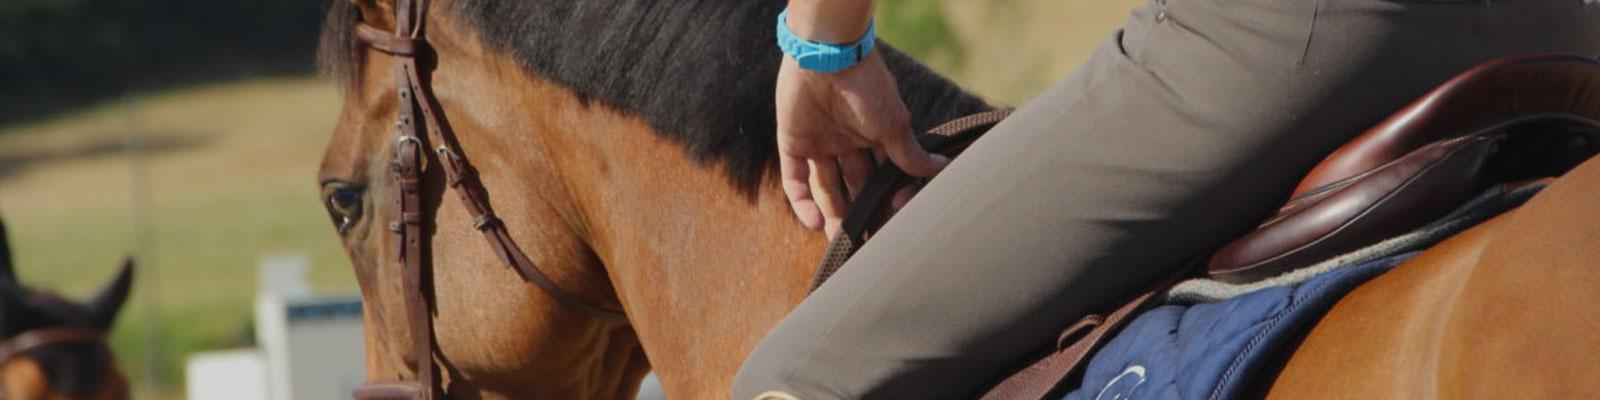 Apprentissage chez le cheval